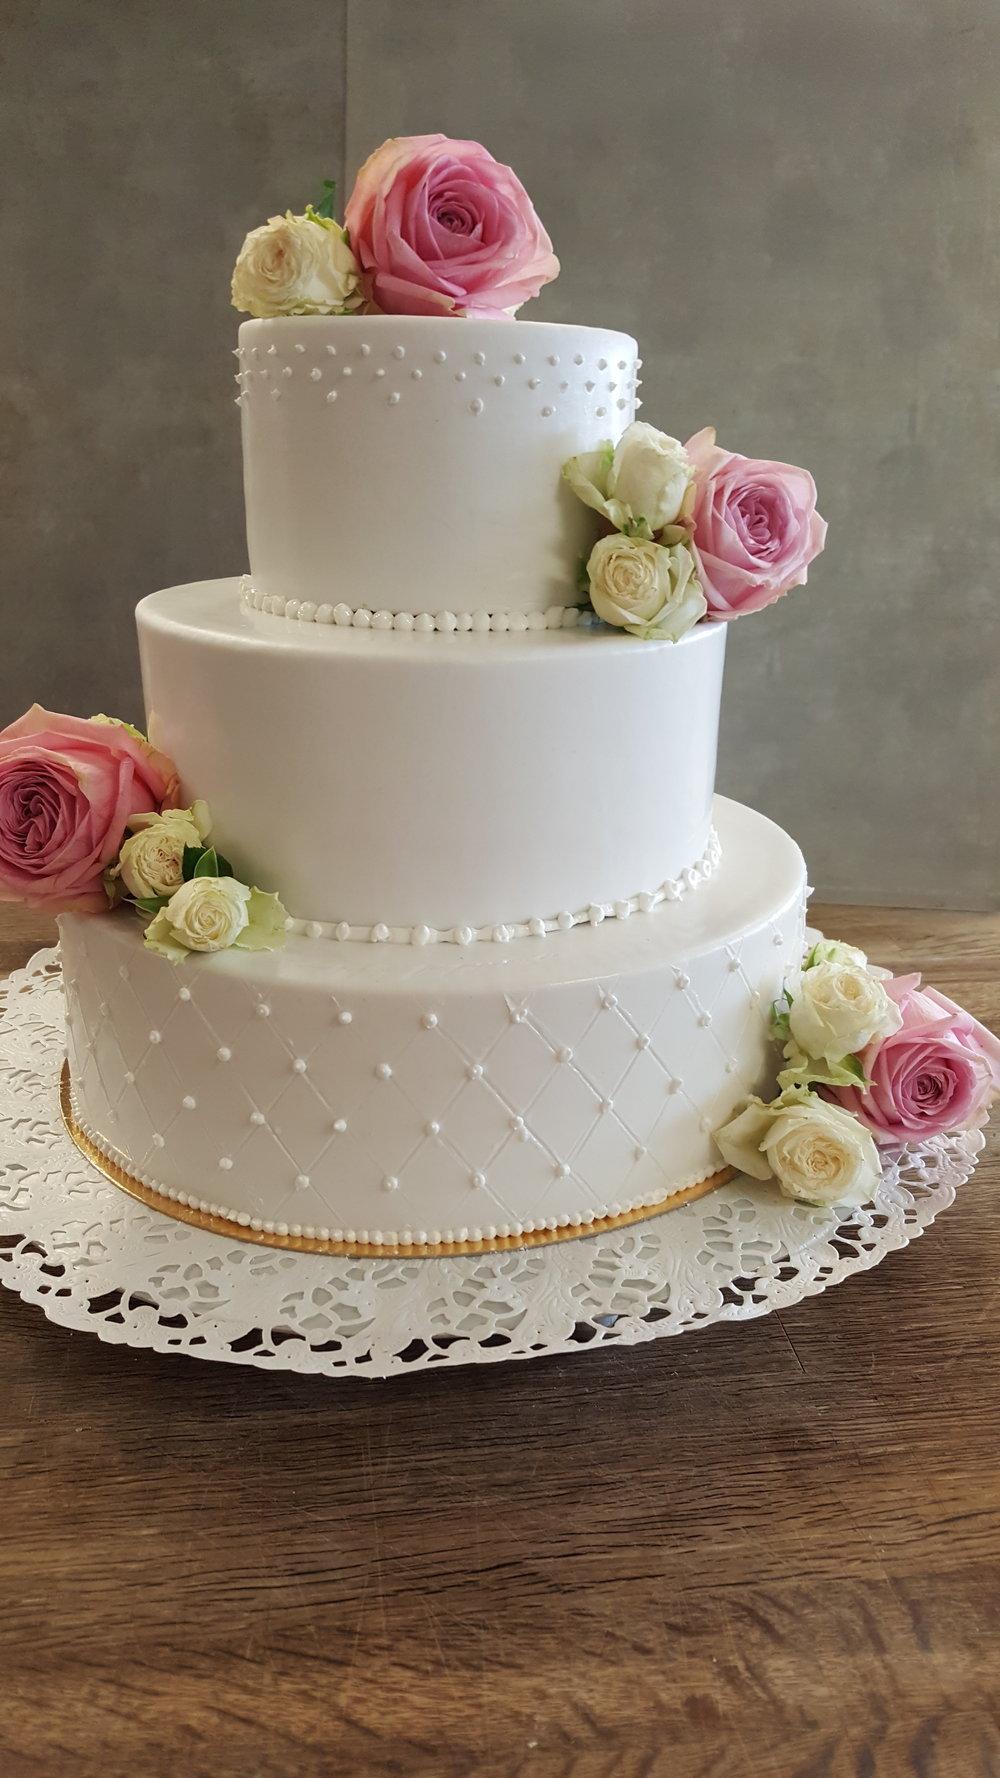 fin tårta 2.jpg